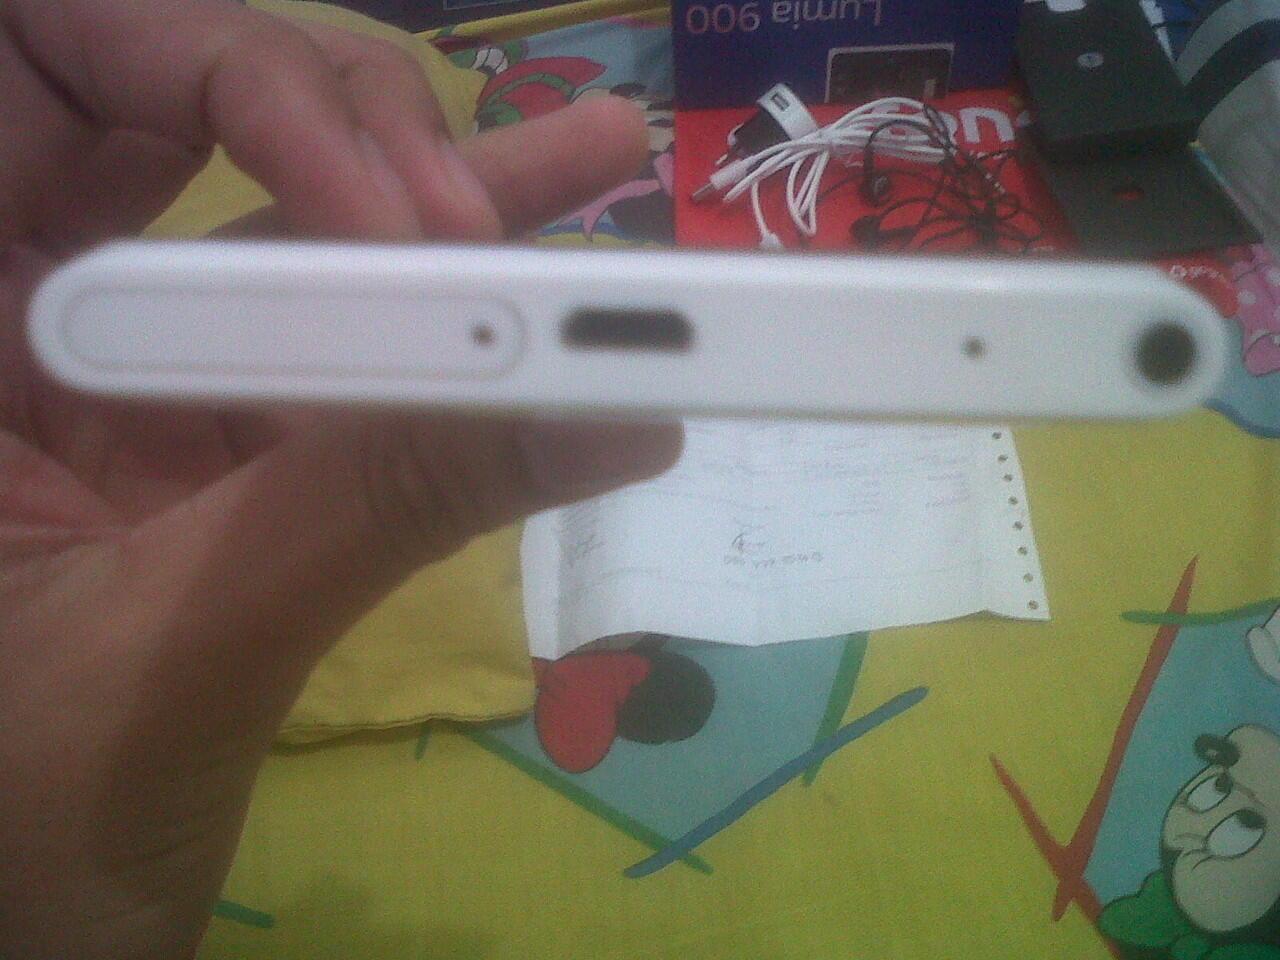 WTS Lumia 900 Beli Di ERAFONE 2-Oktober-2012